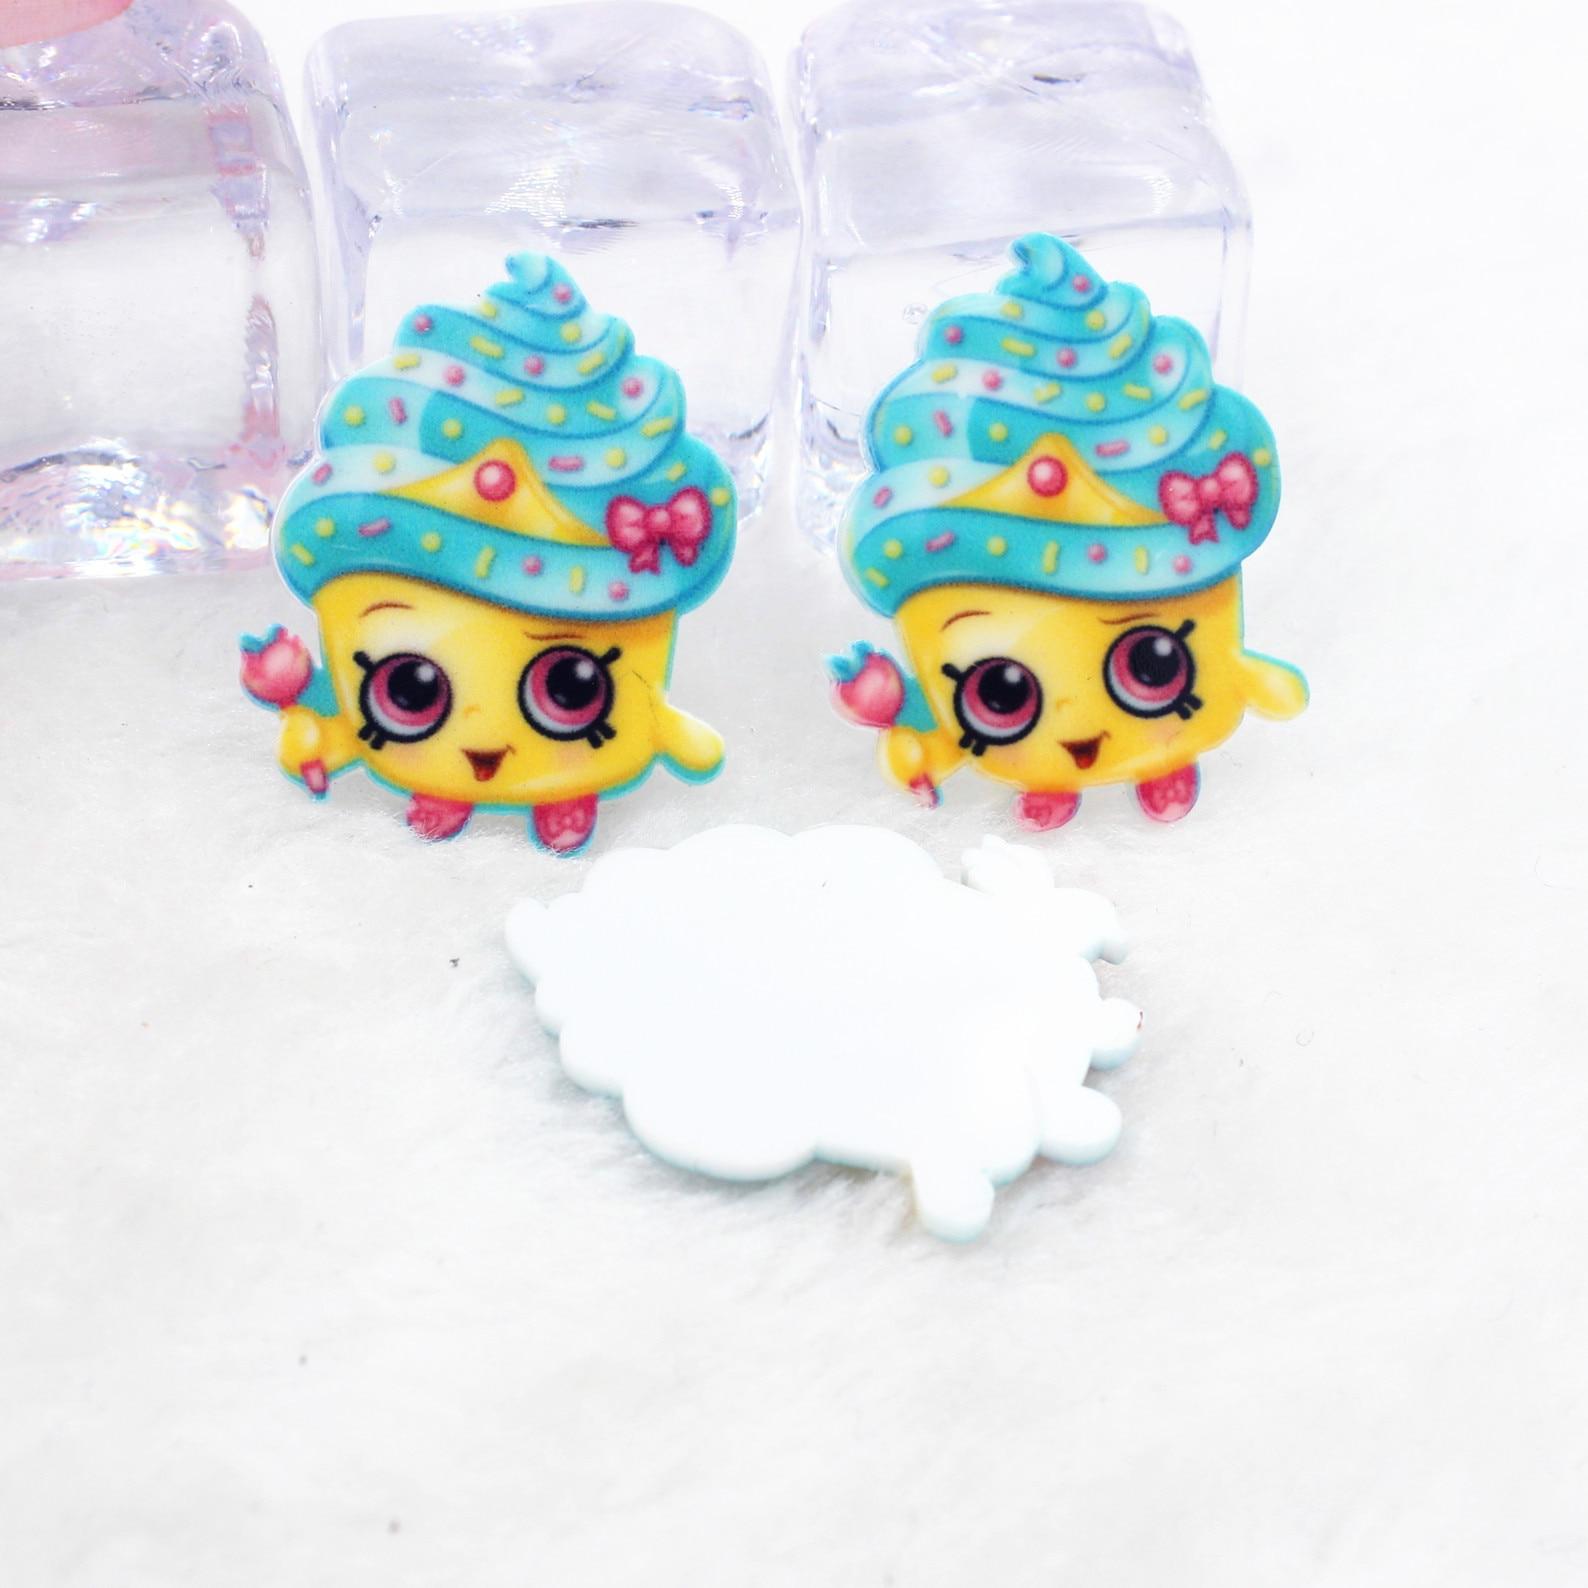 Kawaii cartoon flat back planar resin icecream Figurine food Home decoration craft DIY phone shell hair accessories